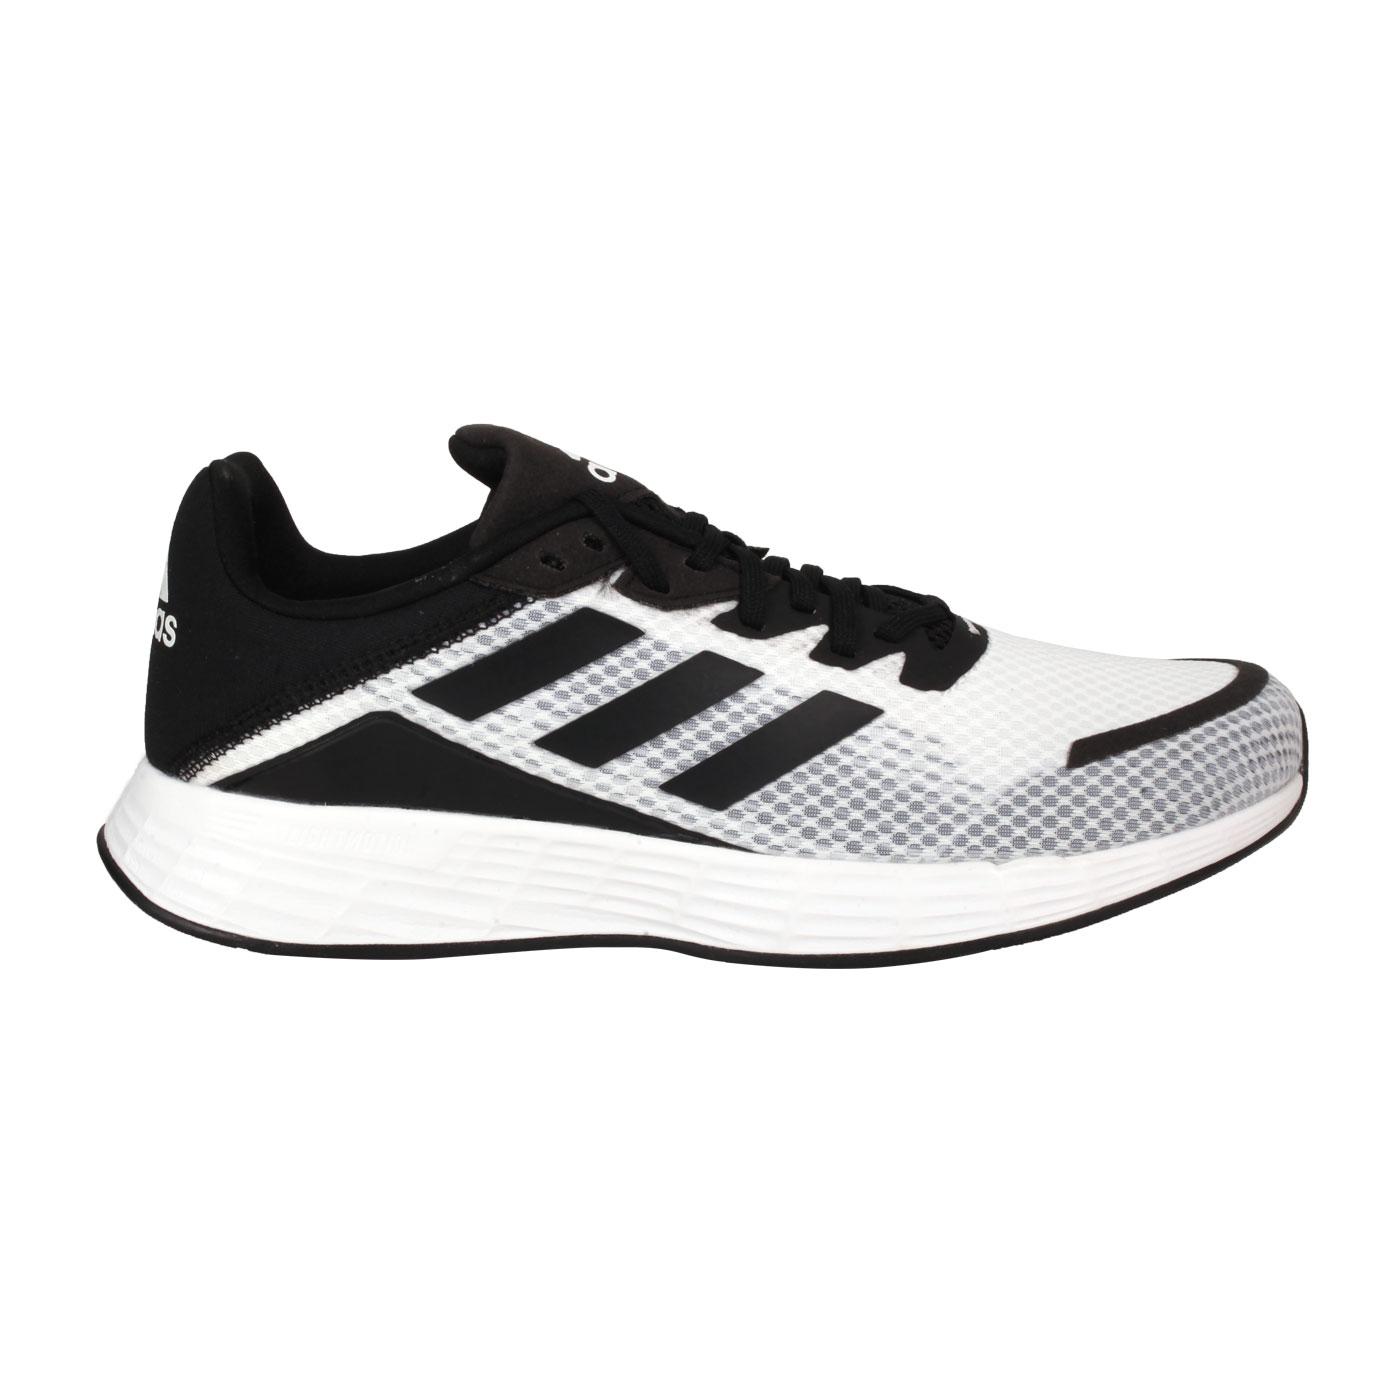 ADIDAS 男款休閒運動鞋  @DURAMO SL@FW7103 - 黑白